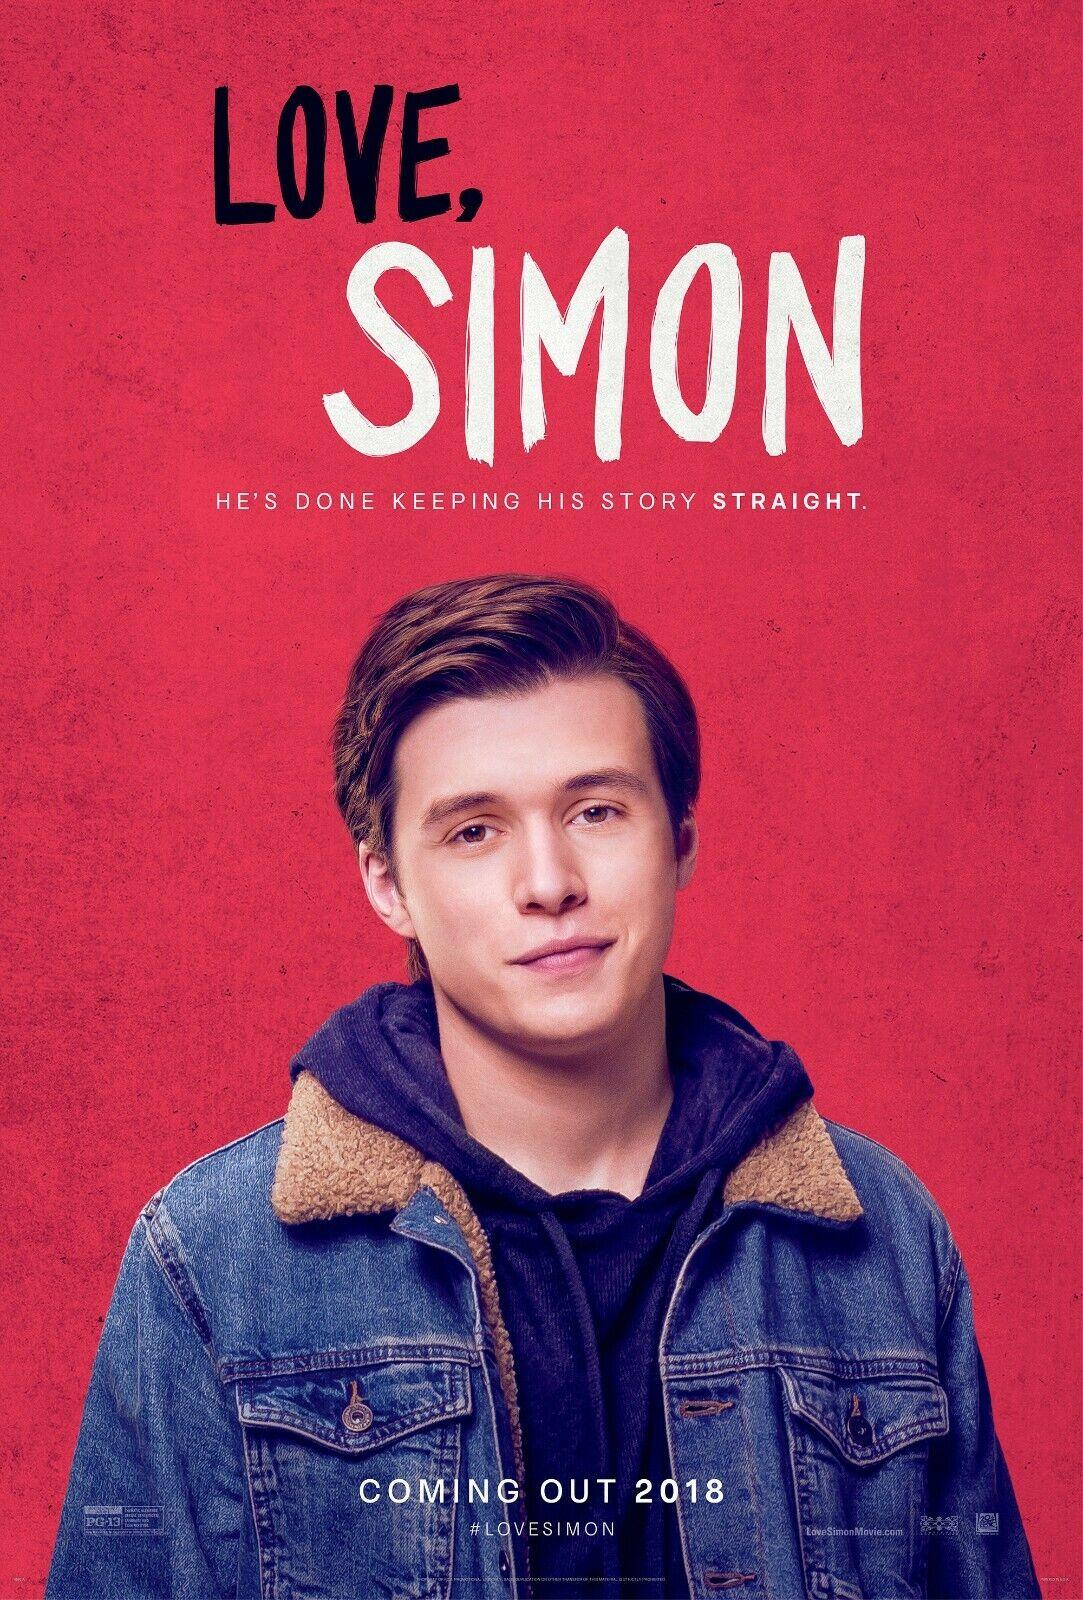 Love Simon movie poster (a) - Nick Robinson - 11 x 17 inches